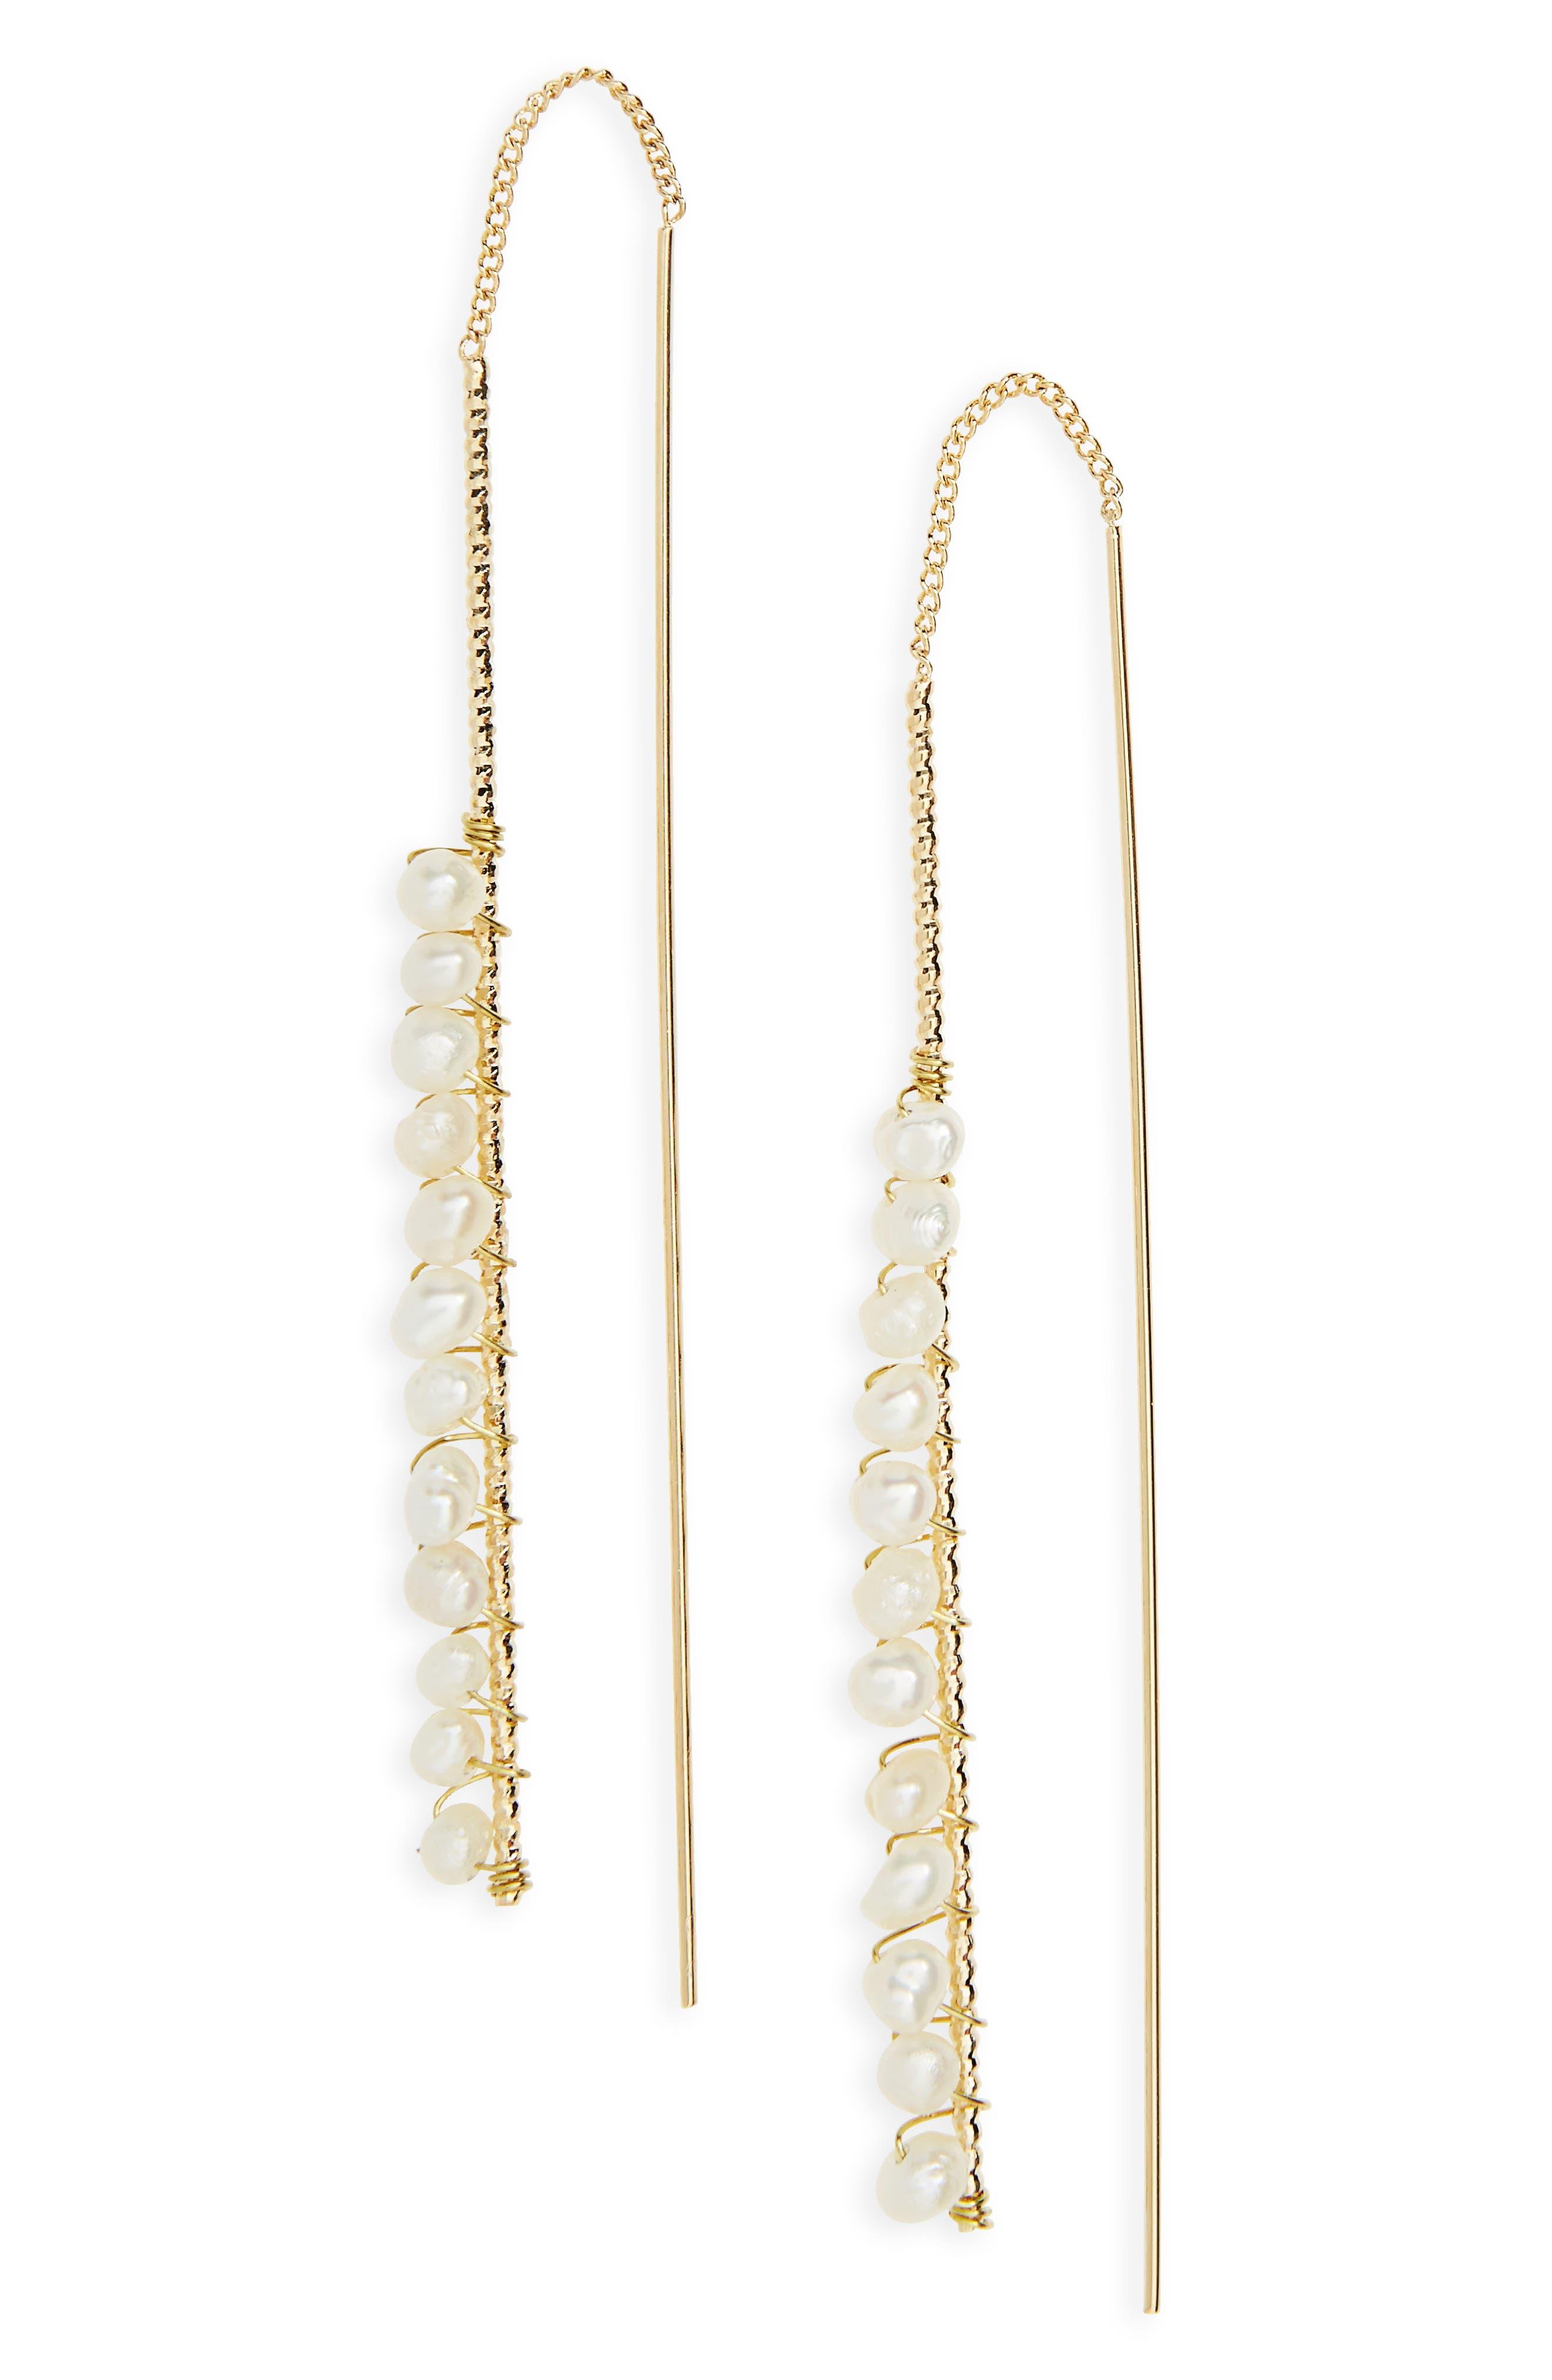 Freshwater Pearl Linear Threader Earrings,                             Main thumbnail 1, color,                             100